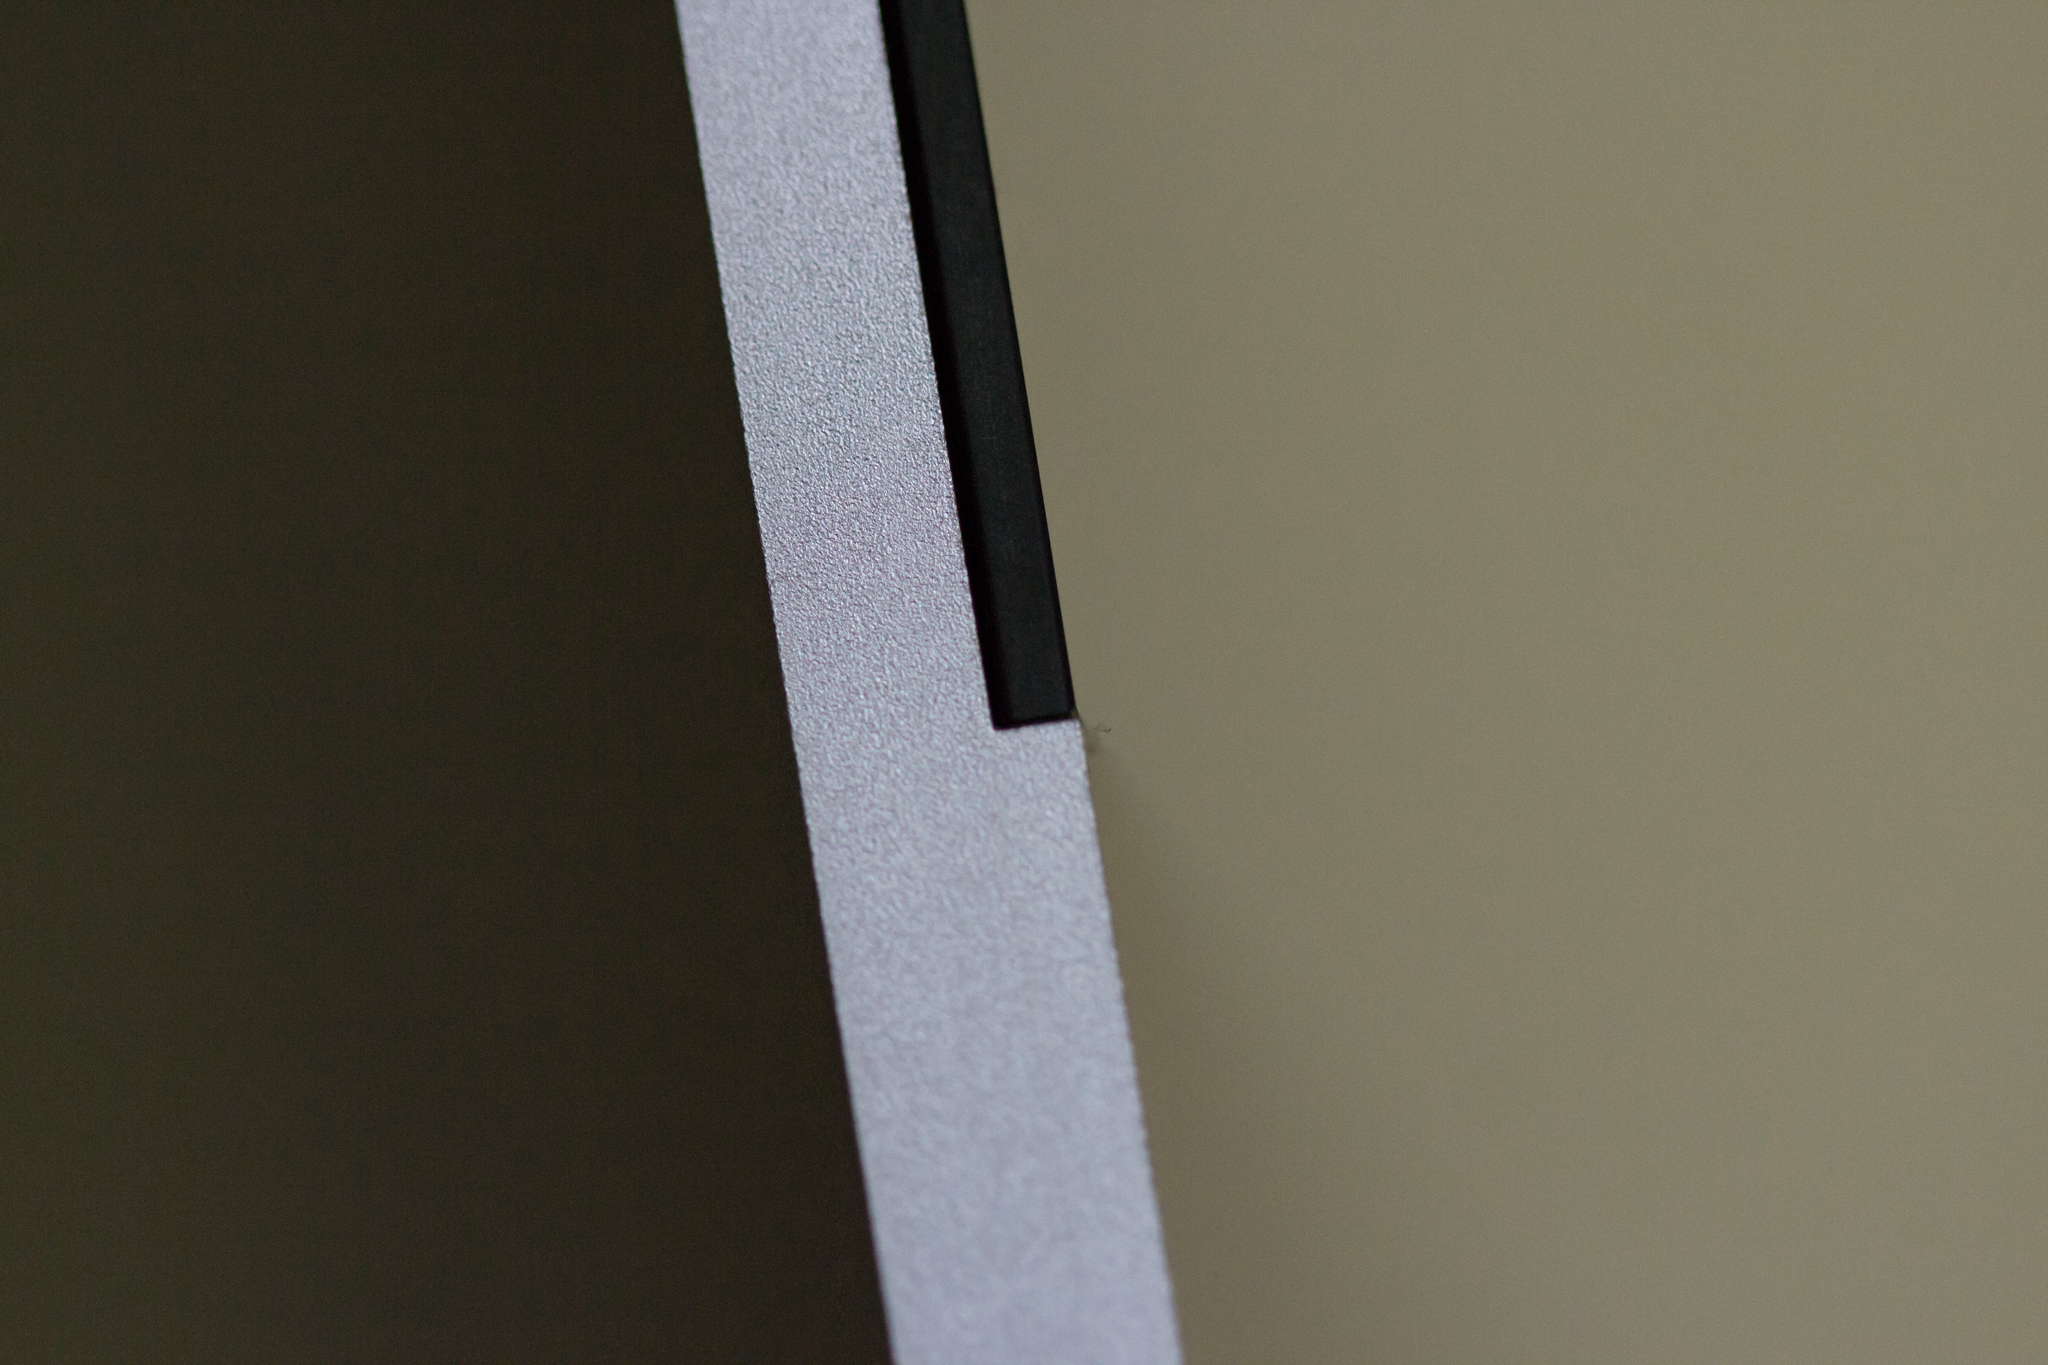 2012 iMac edge close-up